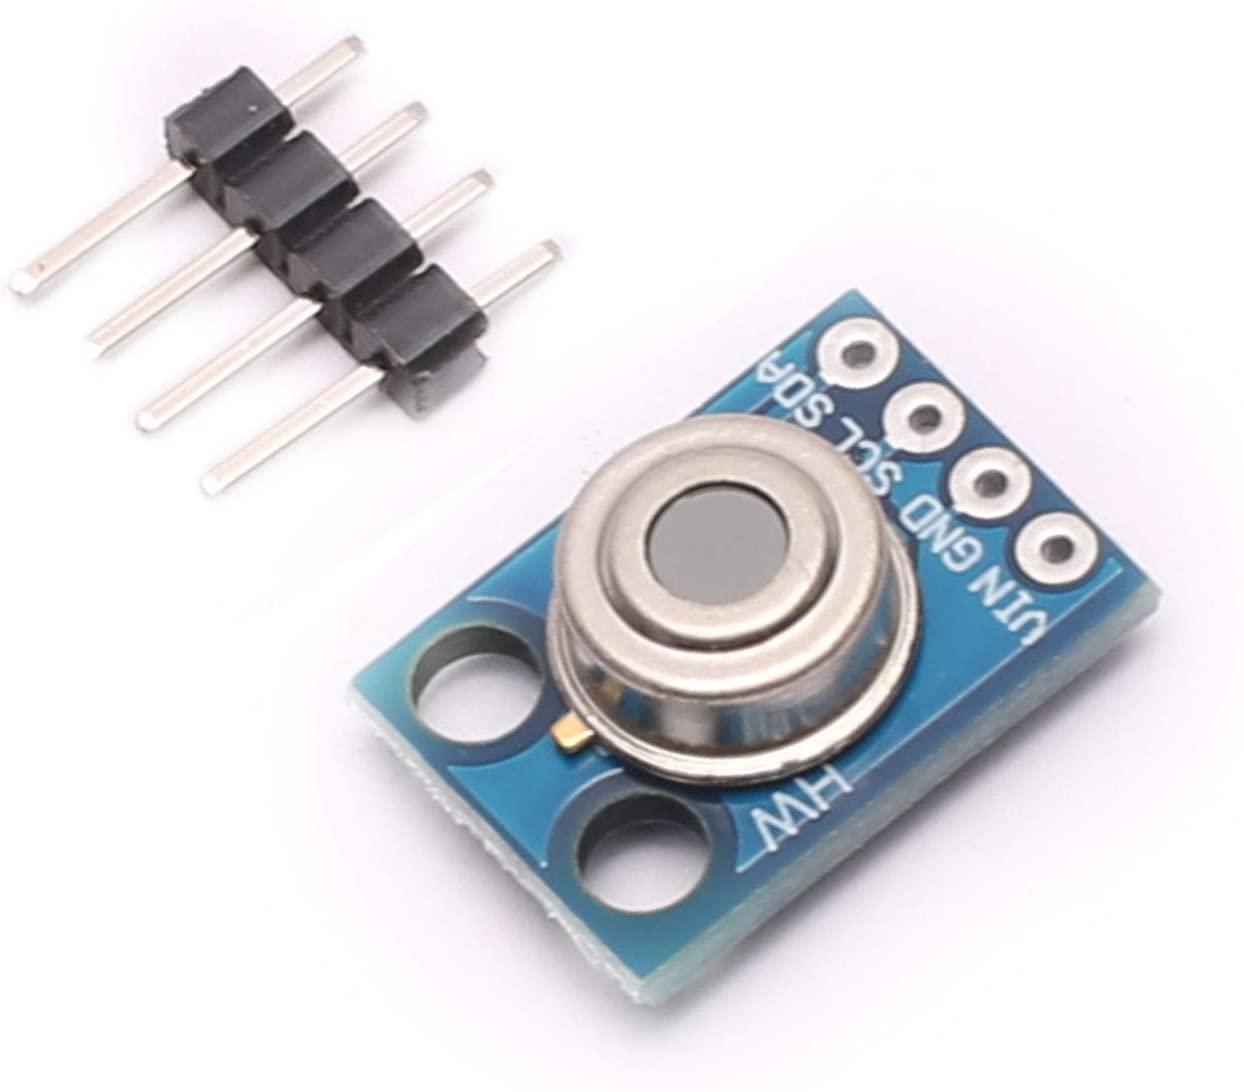 DEVMO MLX90614ESF-BAA GY906 MLX90614 Contactless Temperature Sensor Module IIC I2C Serial Compatible with Arduino